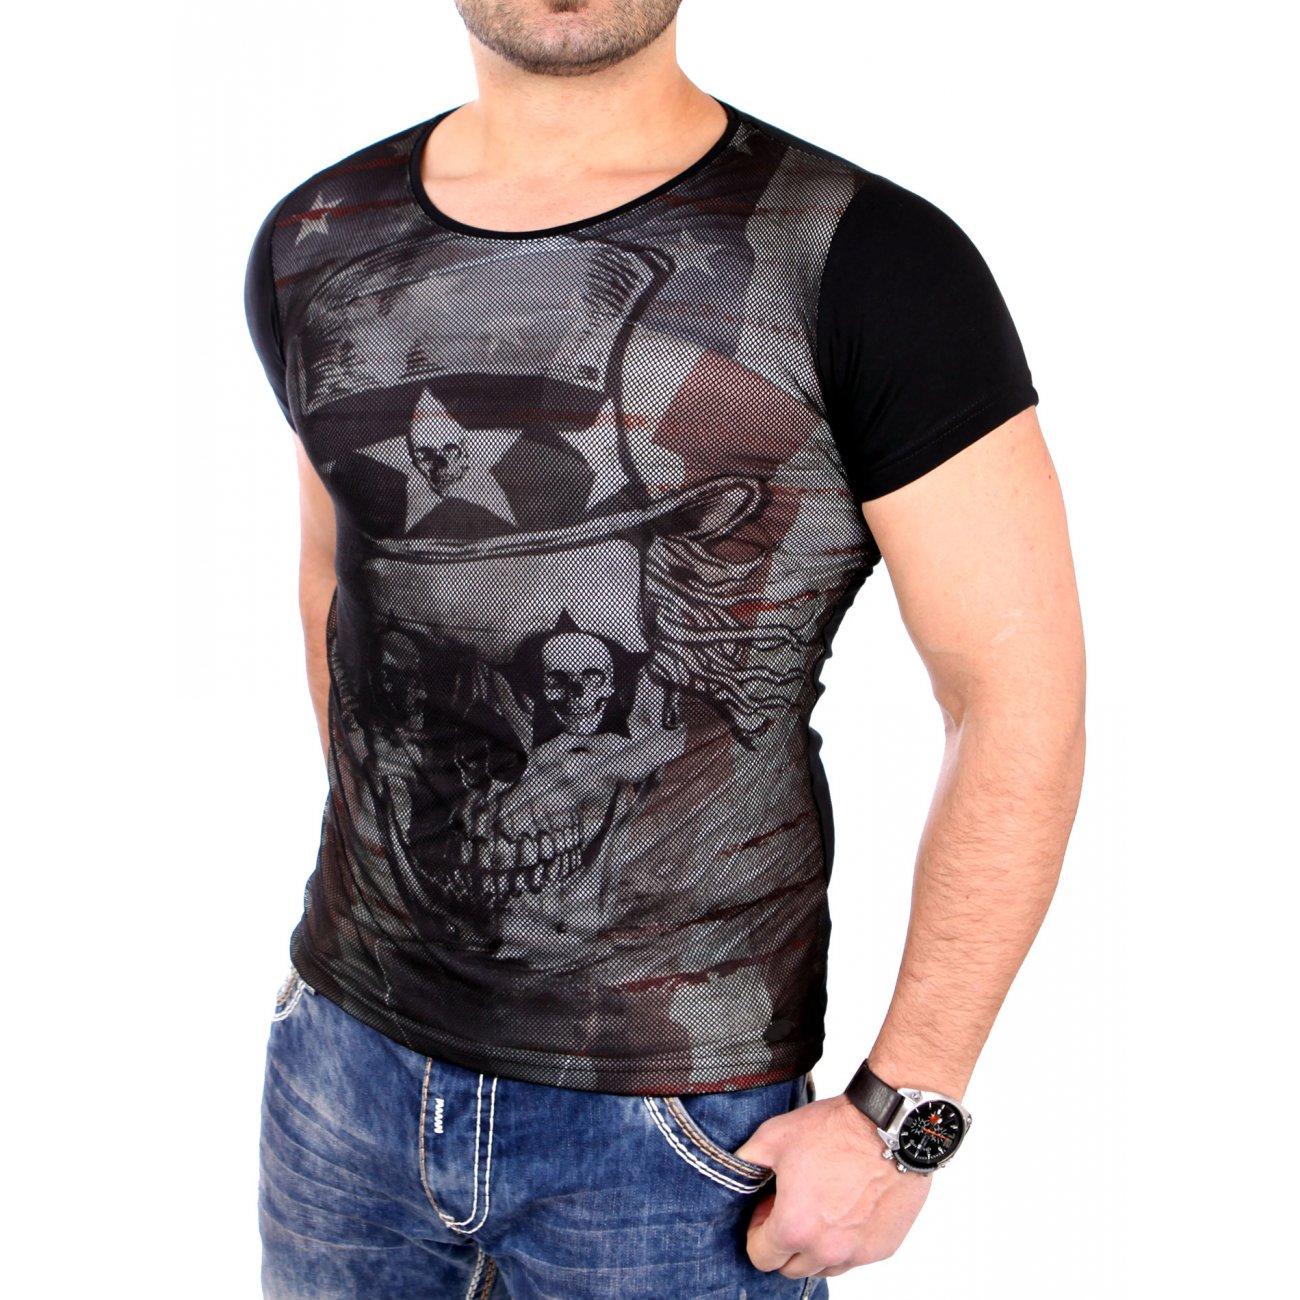 carisma t shirt herren slim fit totenkopf print netz shirt crsm 4277. Black Bedroom Furniture Sets. Home Design Ideas